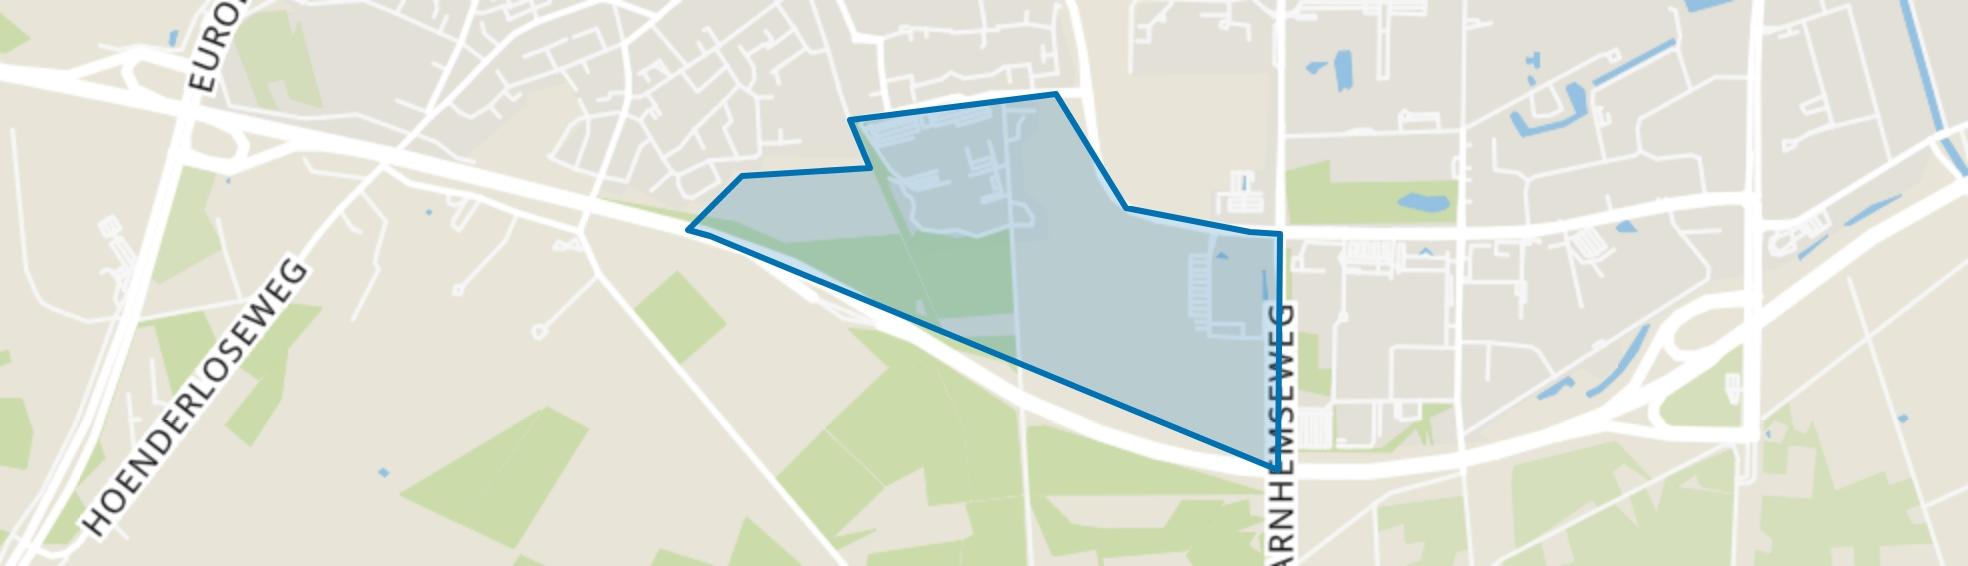 Dennenheuvel, Apeldoorn map